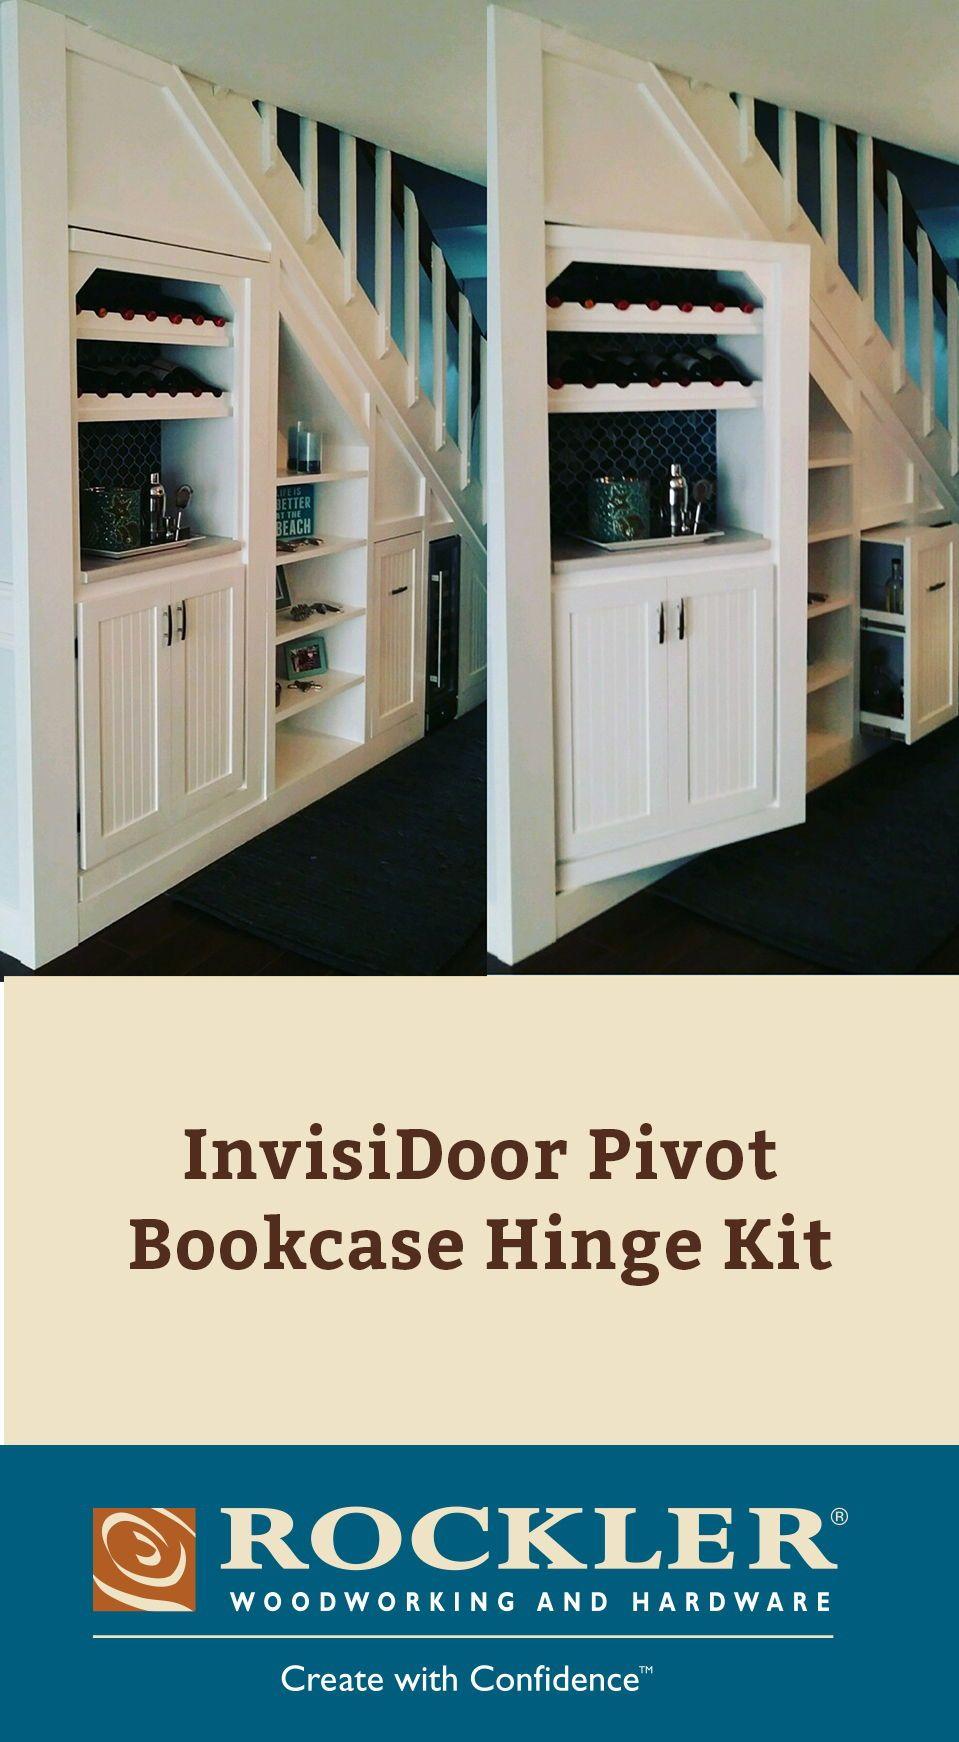 Invisidoor Pivot Bookcase Hinge Kit Bookcase Door Diy Hidden Door Bookcase Bookcase Door